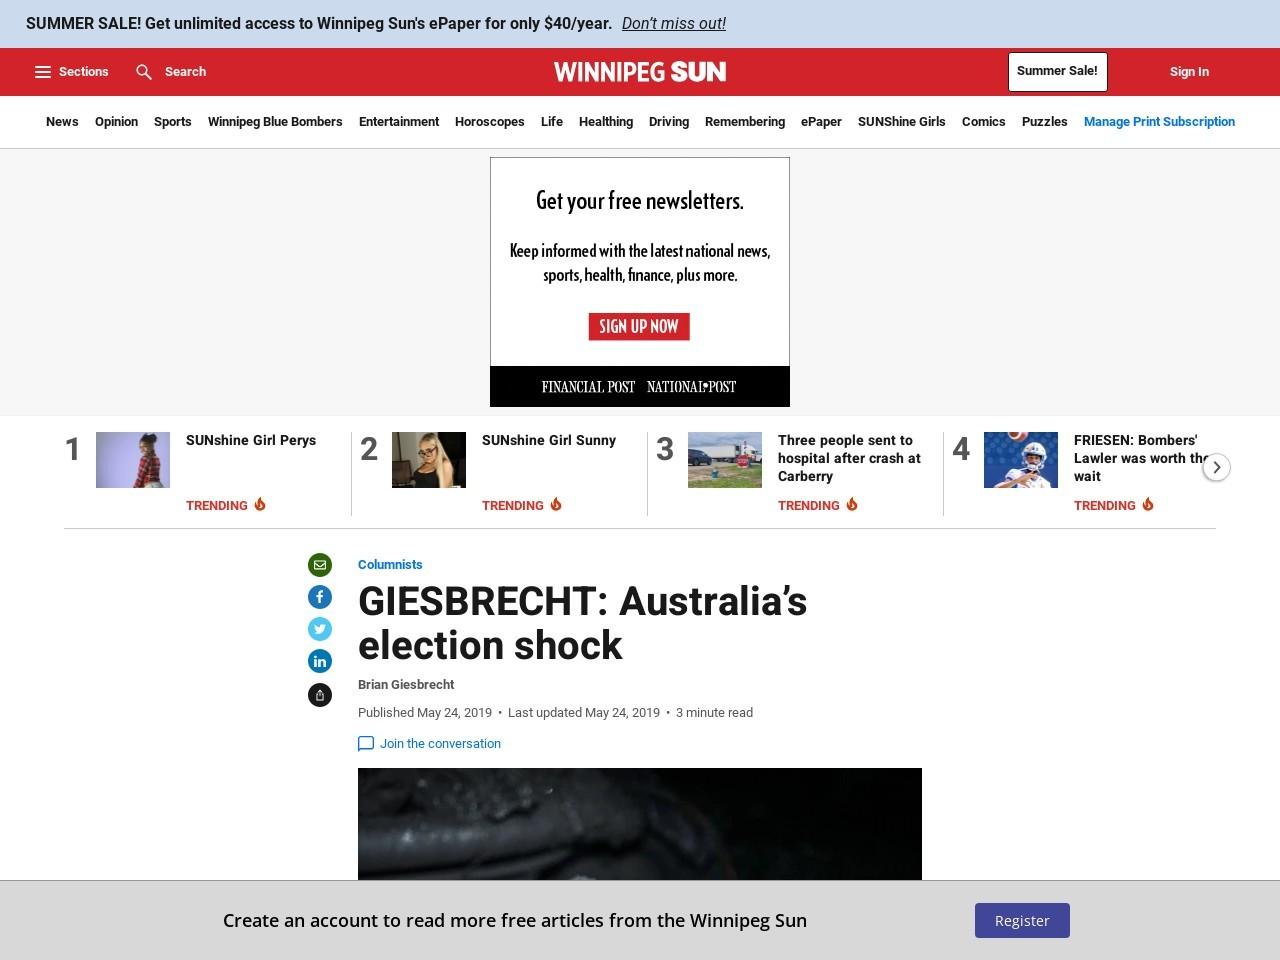 GIESBRECHT: Australia's election shock